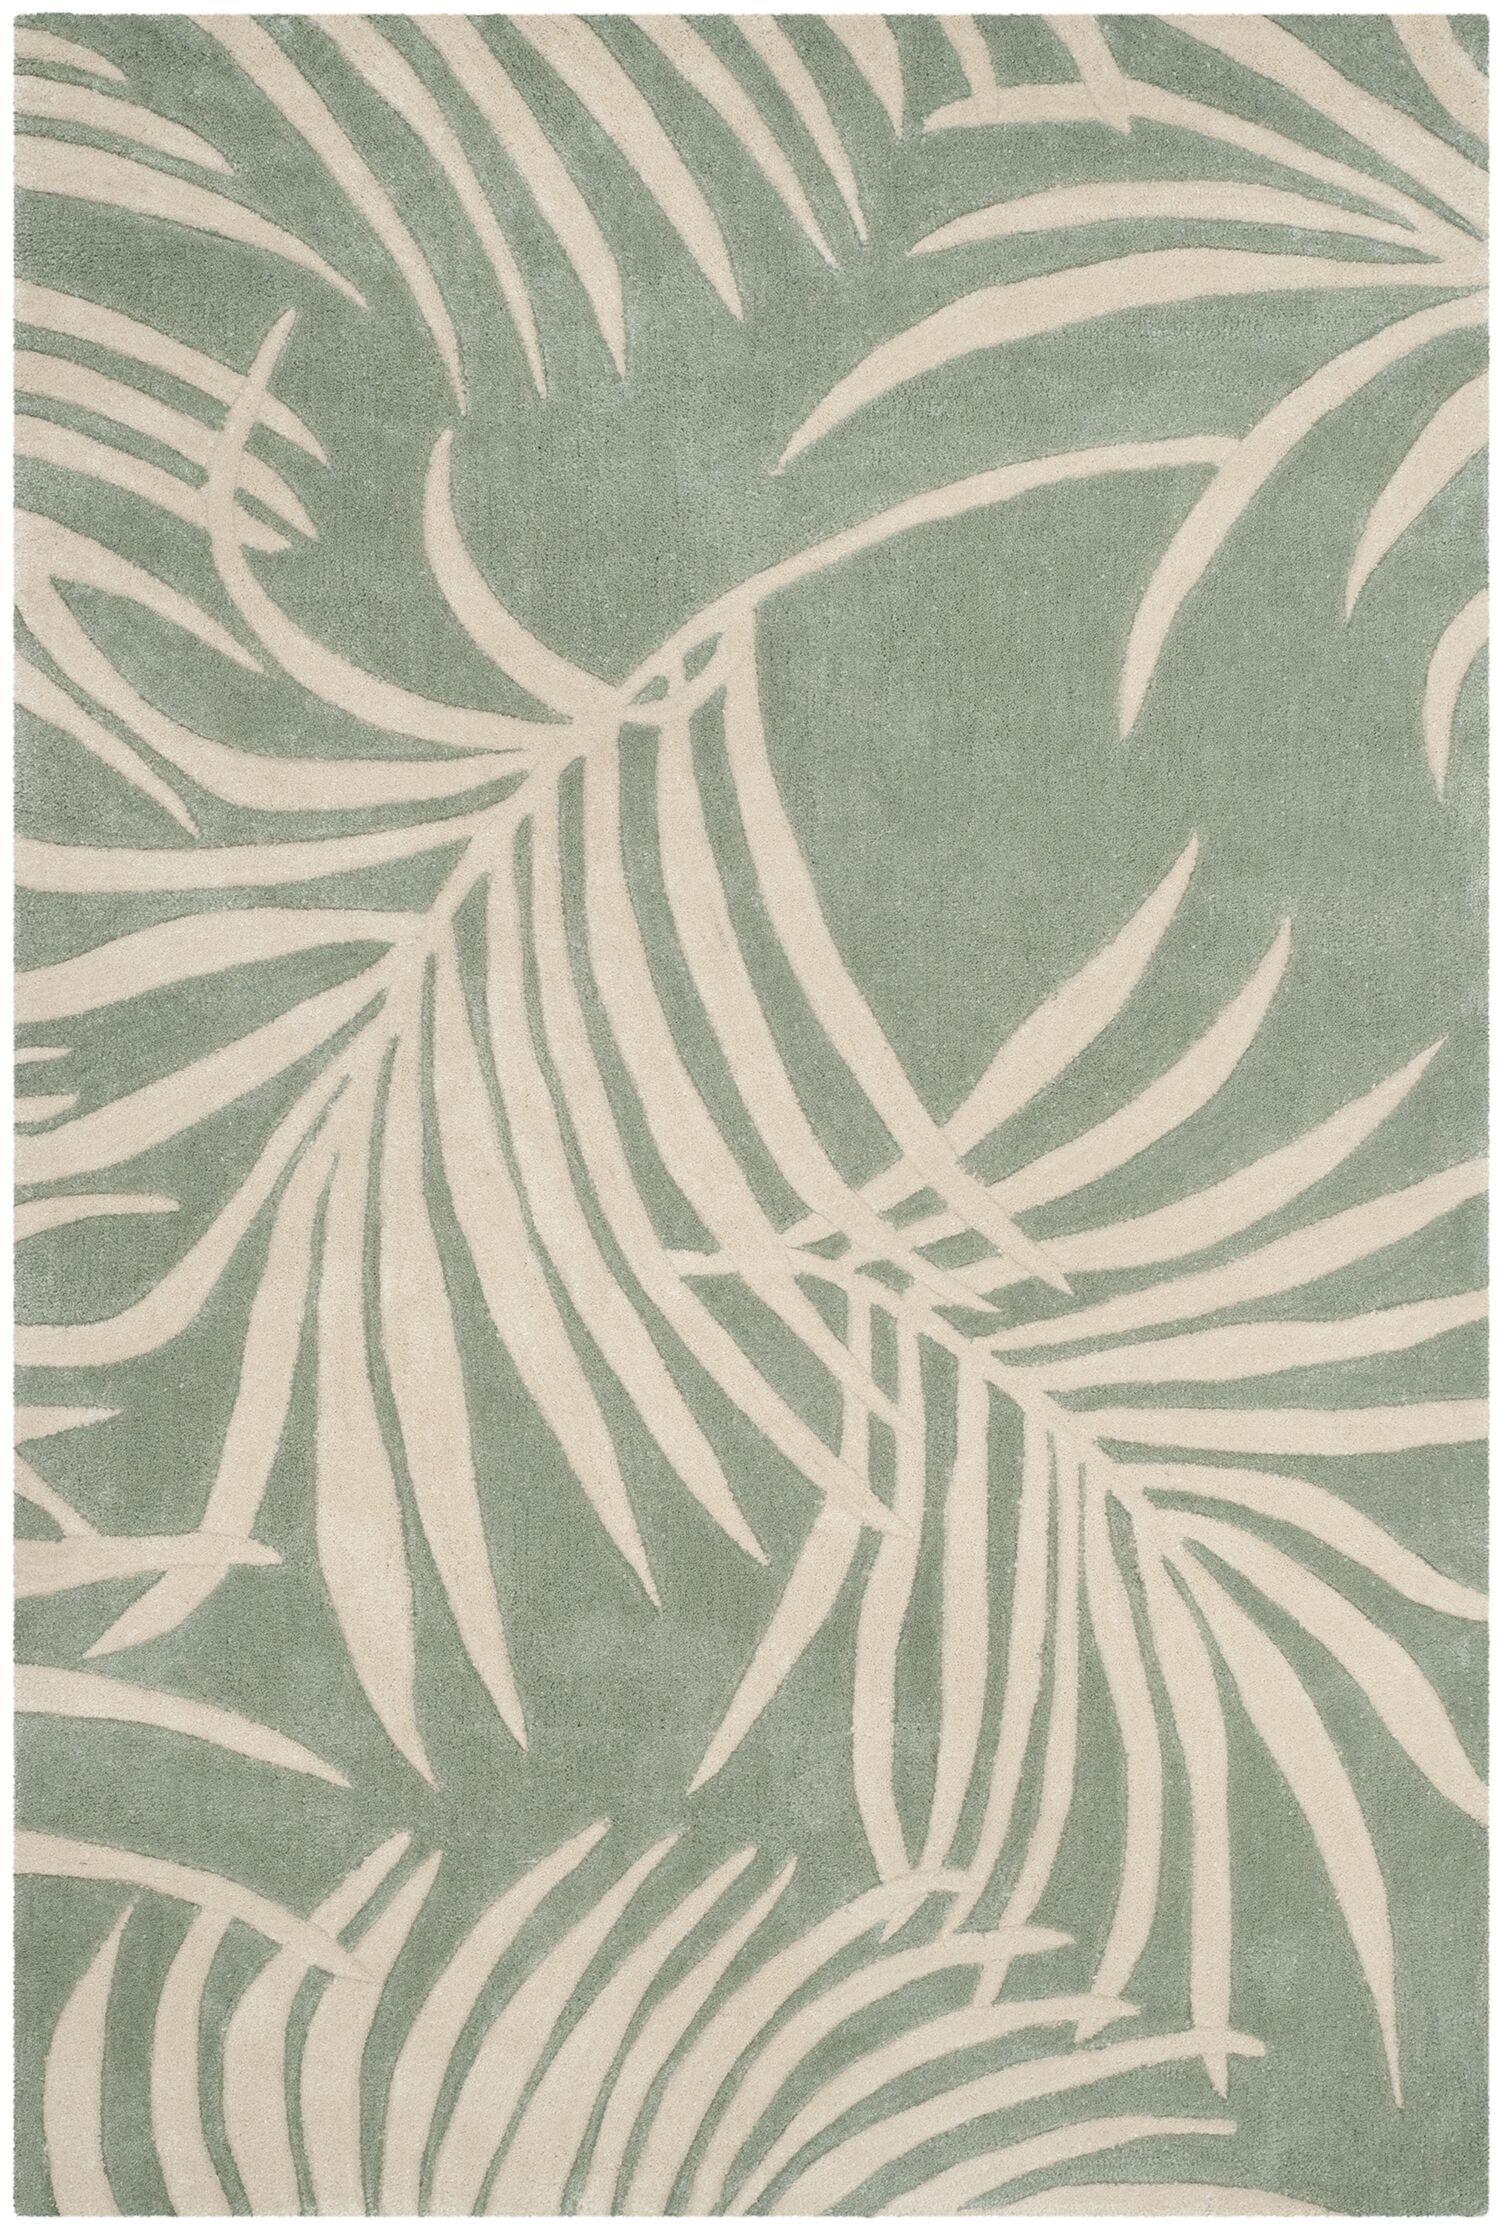 Palmnue Hand-Hooked Beige/Gray Area Rug Rug Size: Rectangle 8' x 10'